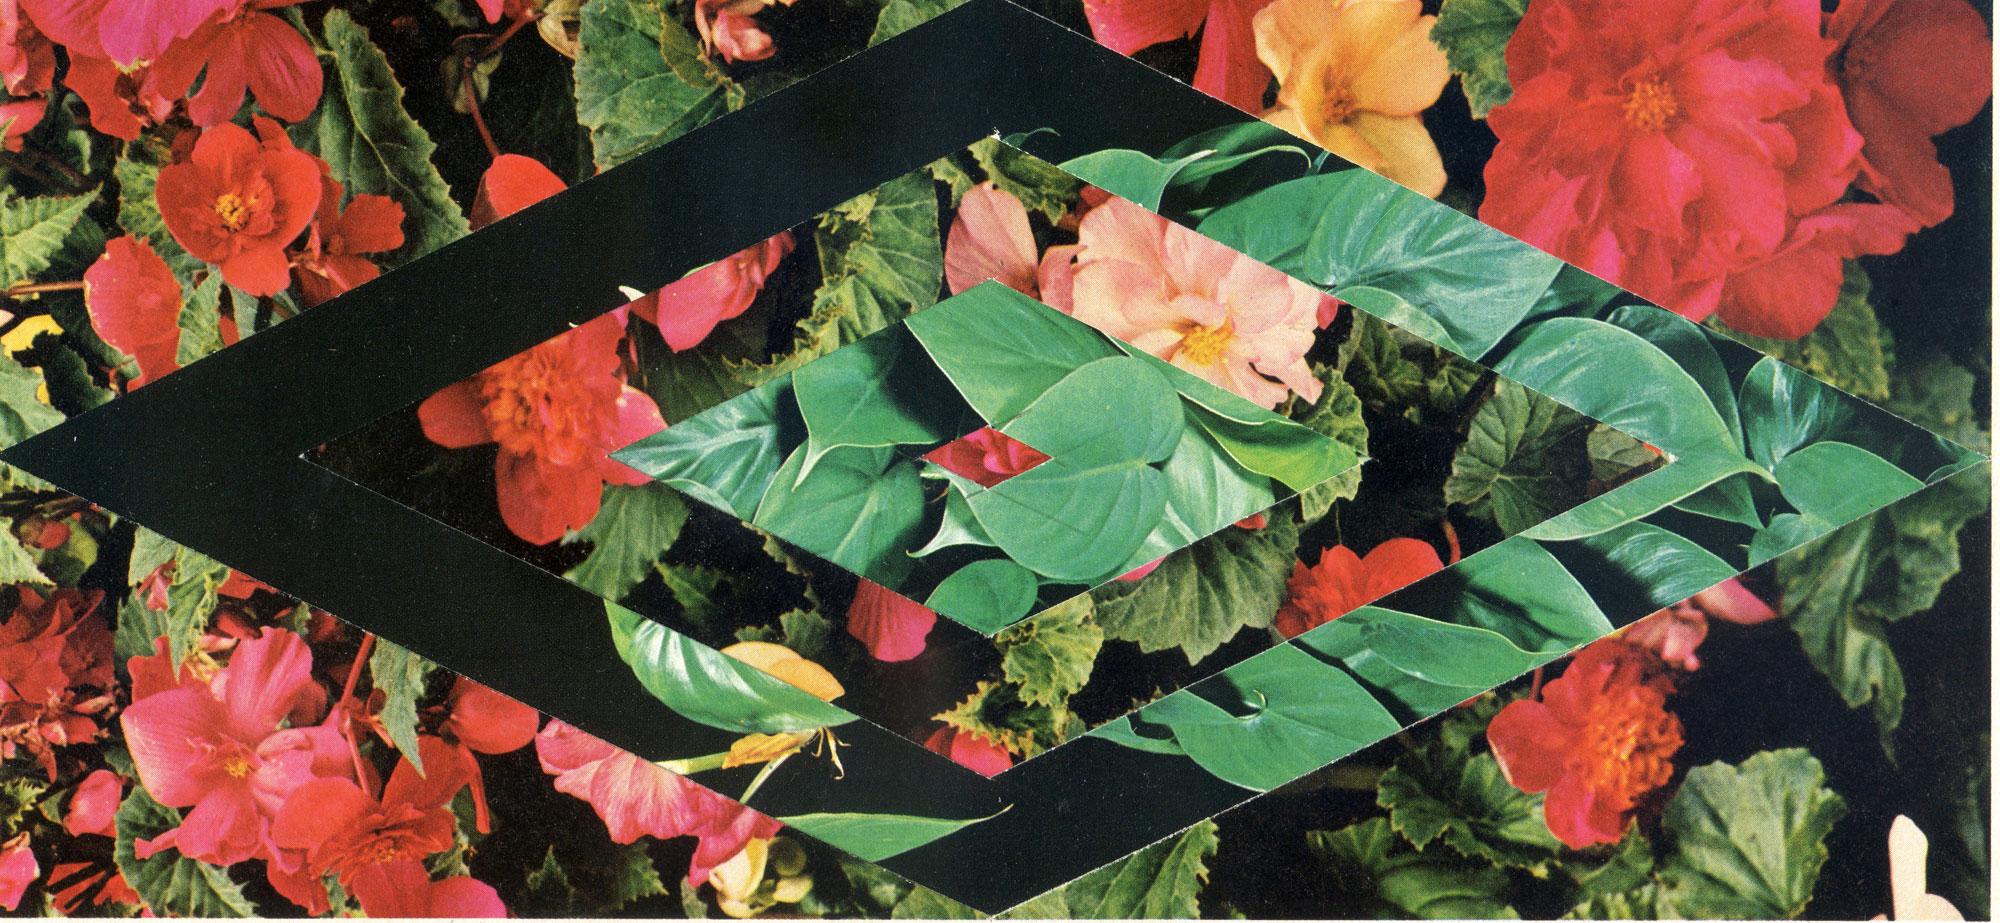 p5_luis_dourado_the_garden_fourthmemory_yatzer.jpg